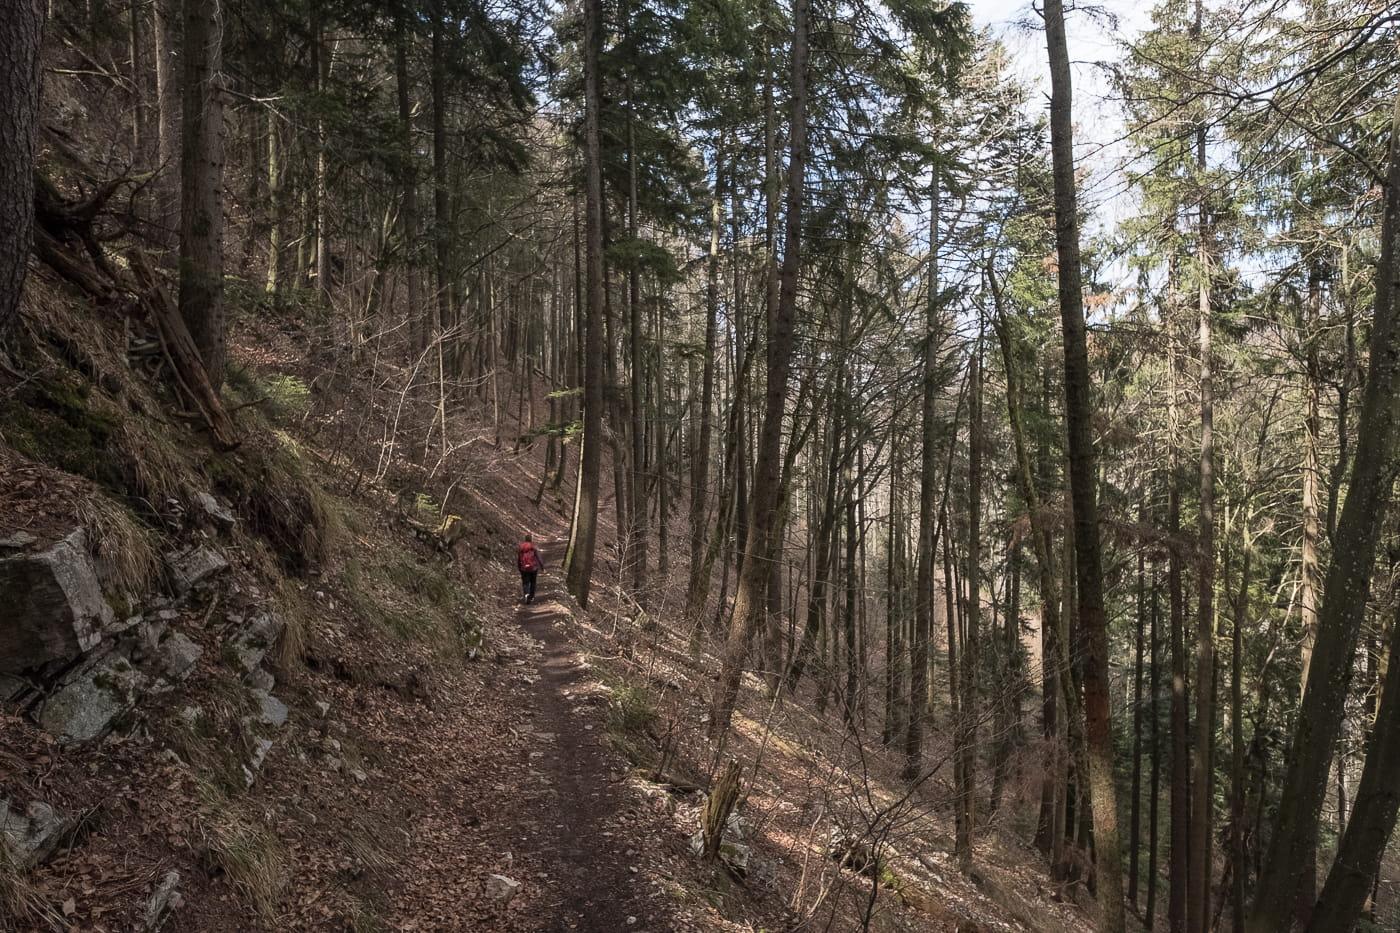 Wuesthöchi Wanderung durch Wald